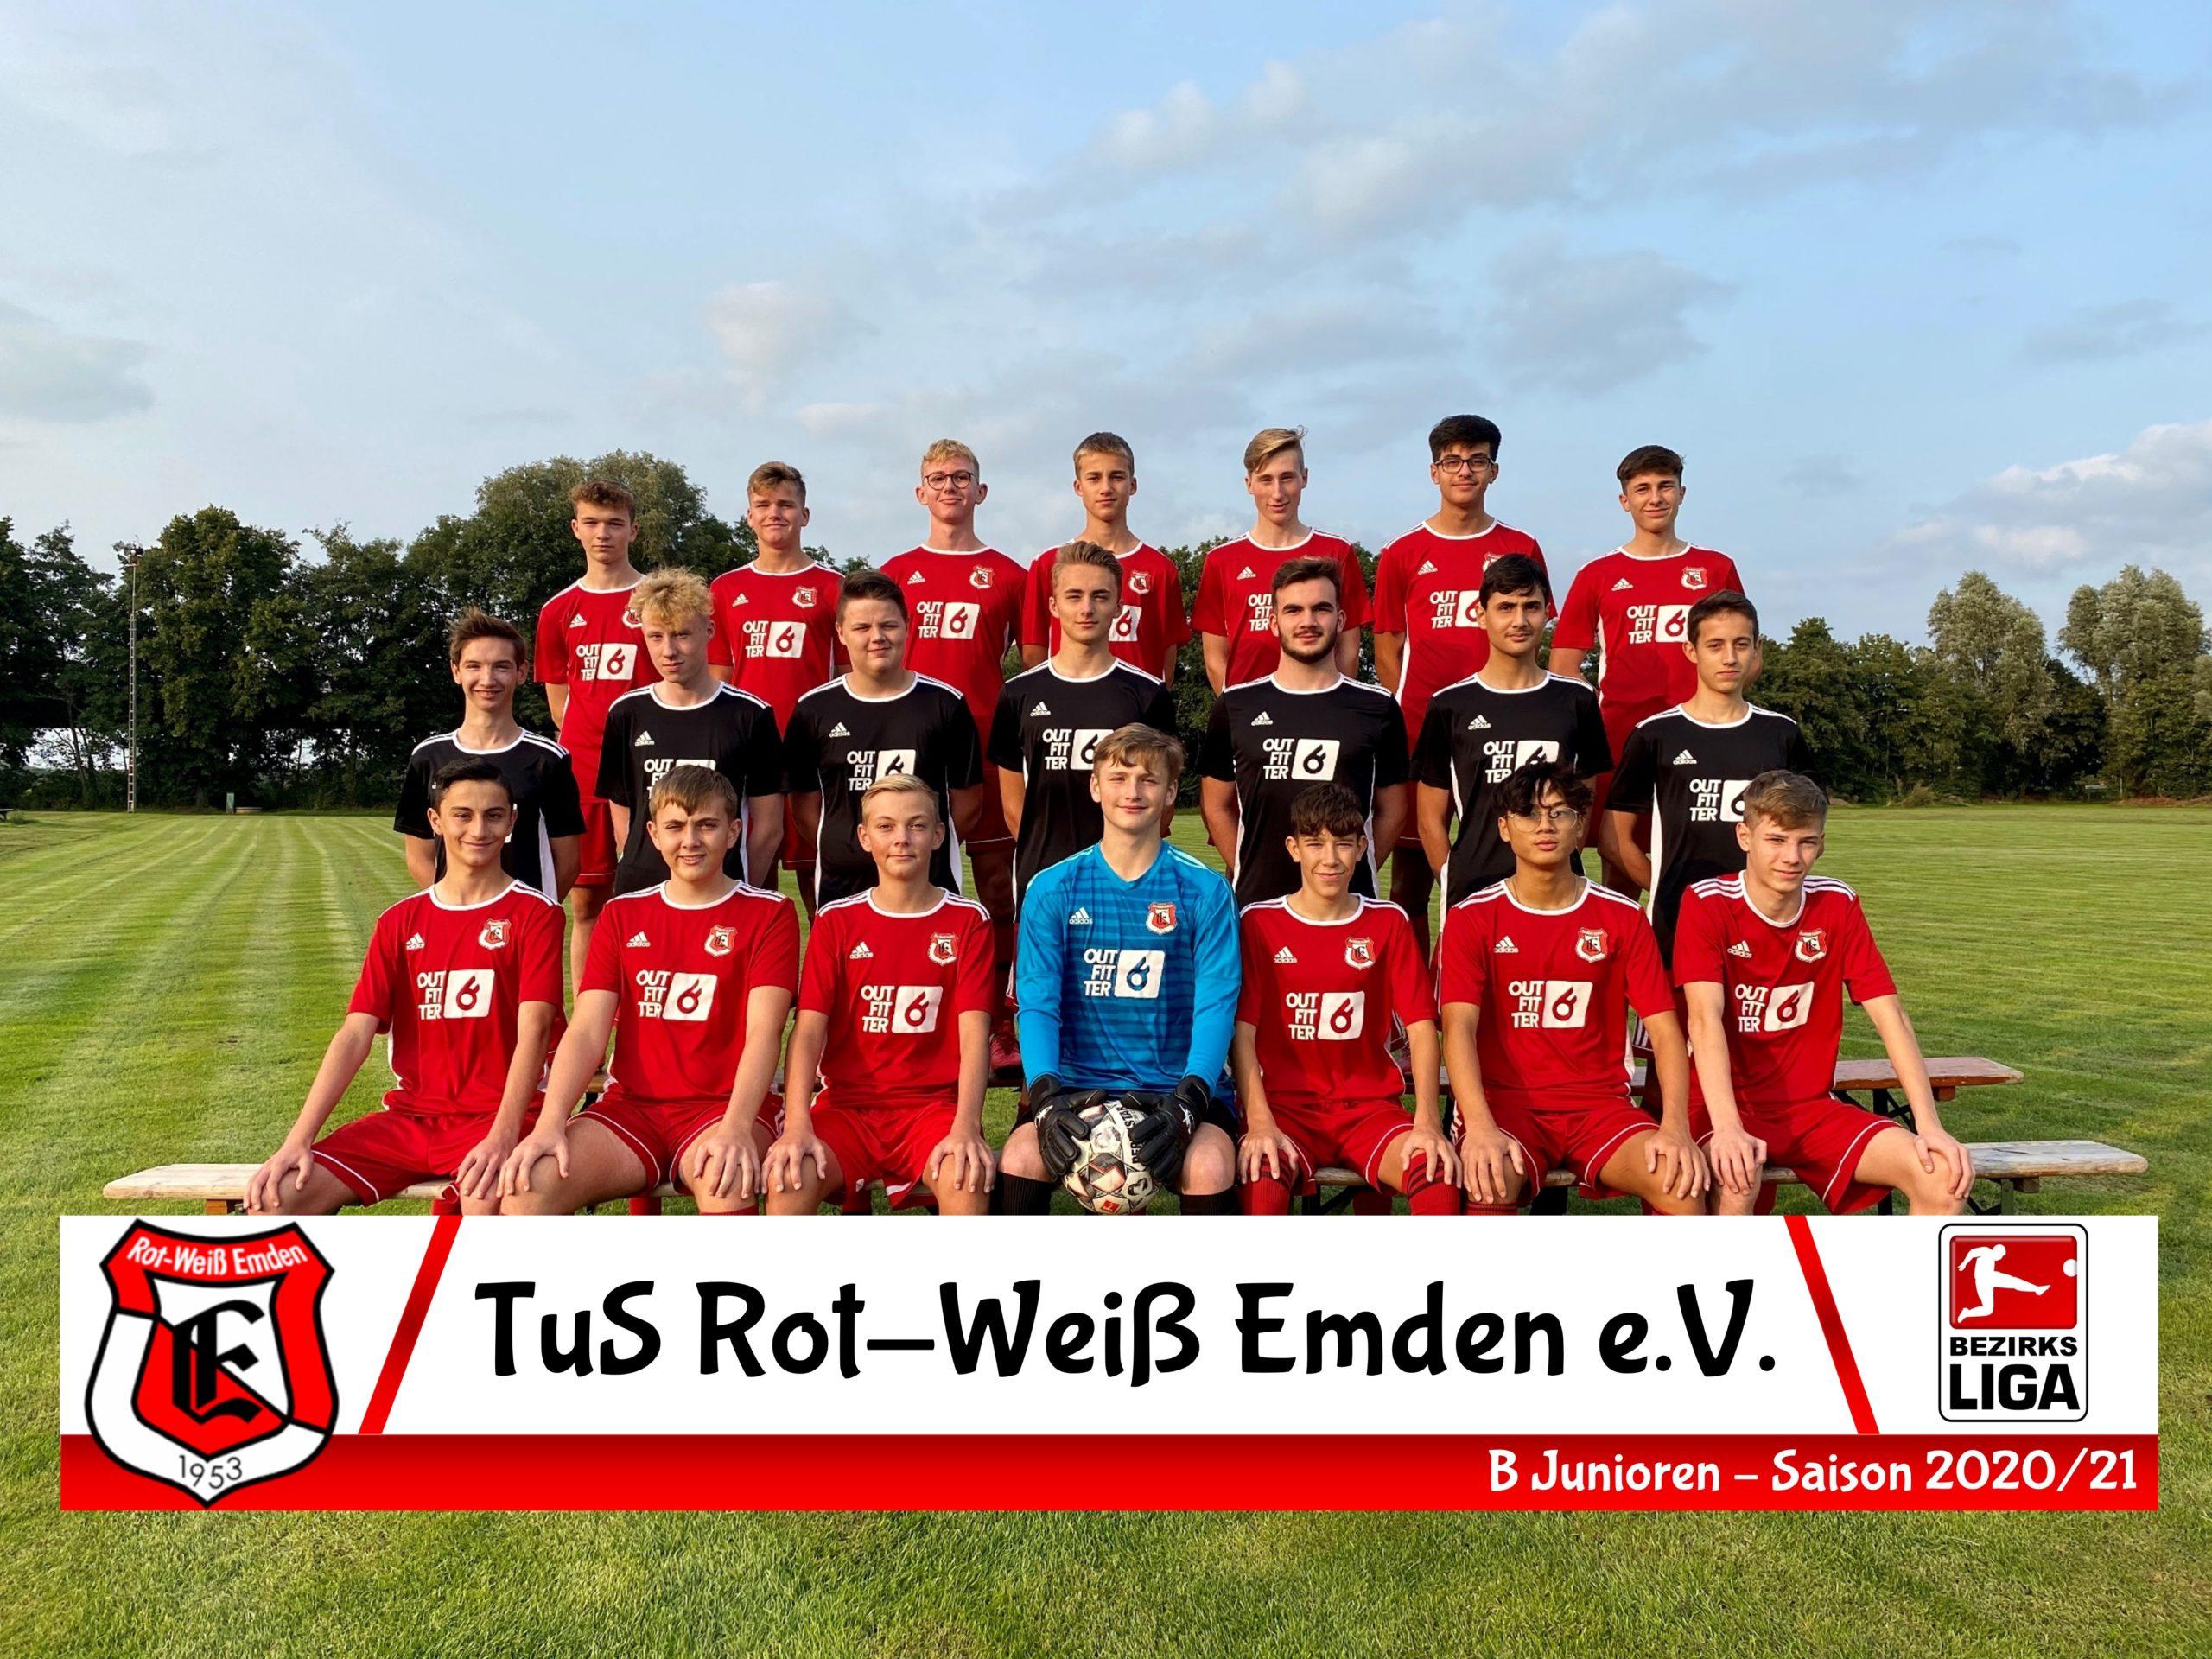 JSG TuS RW Emden/Kickers Emden II Saison 20/21